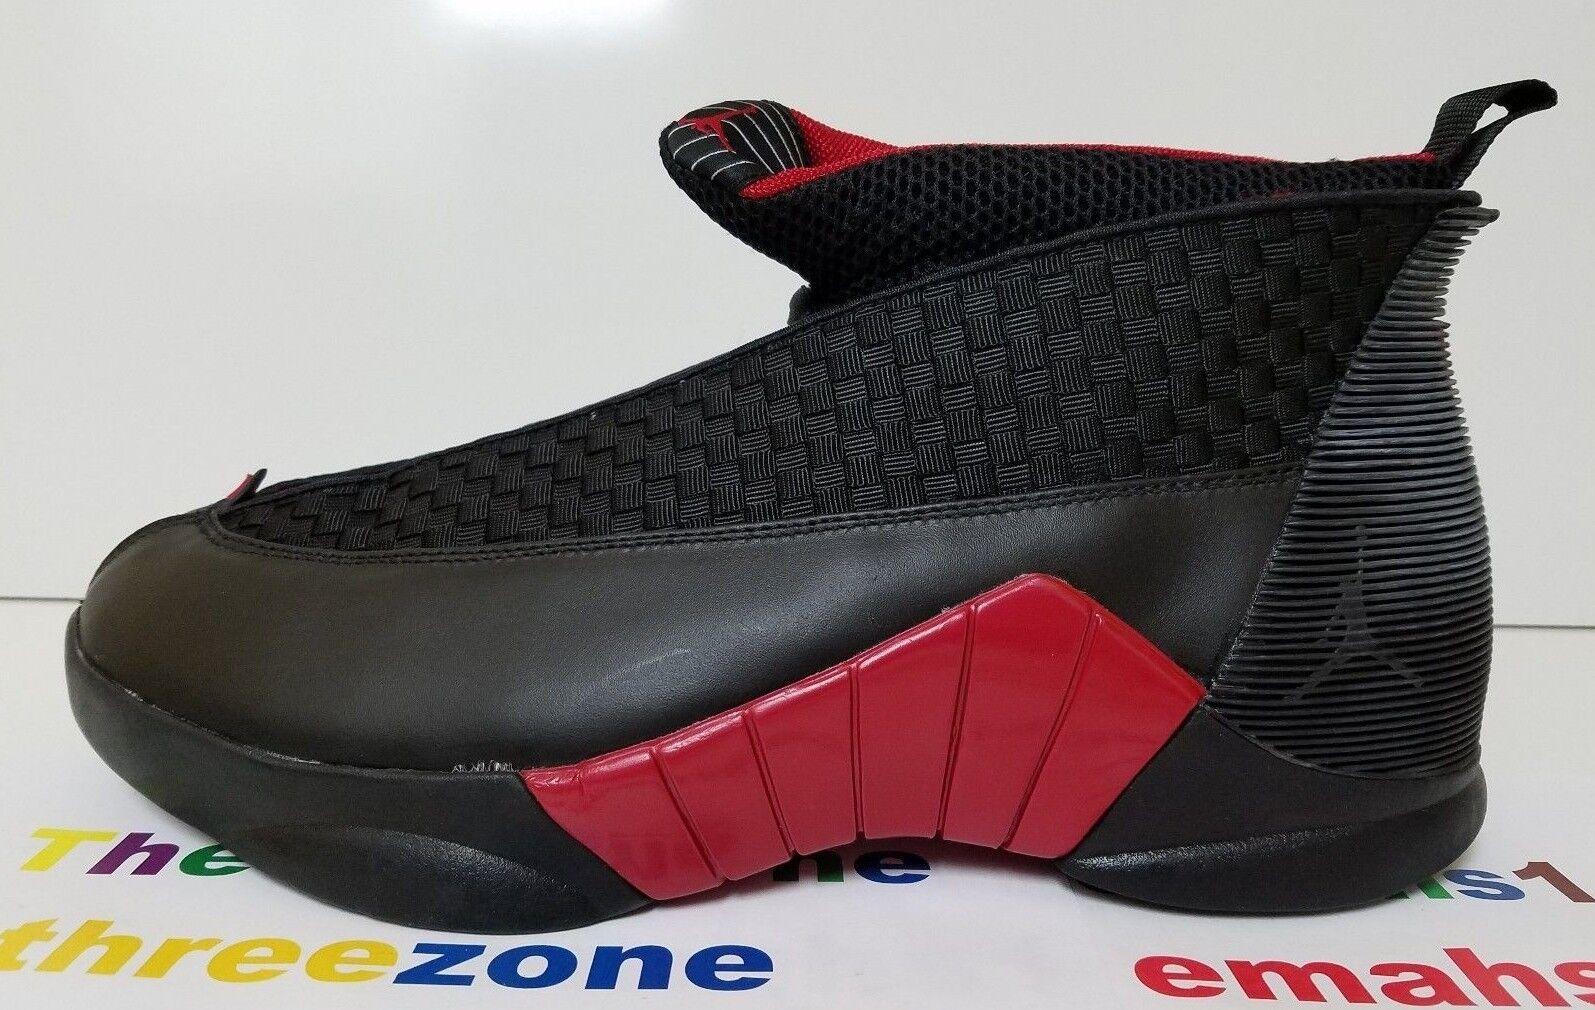 Nike Air Jordan 15 Retro CDP sz 11.5 XV space jam playoffs xi iv iii viii kubo